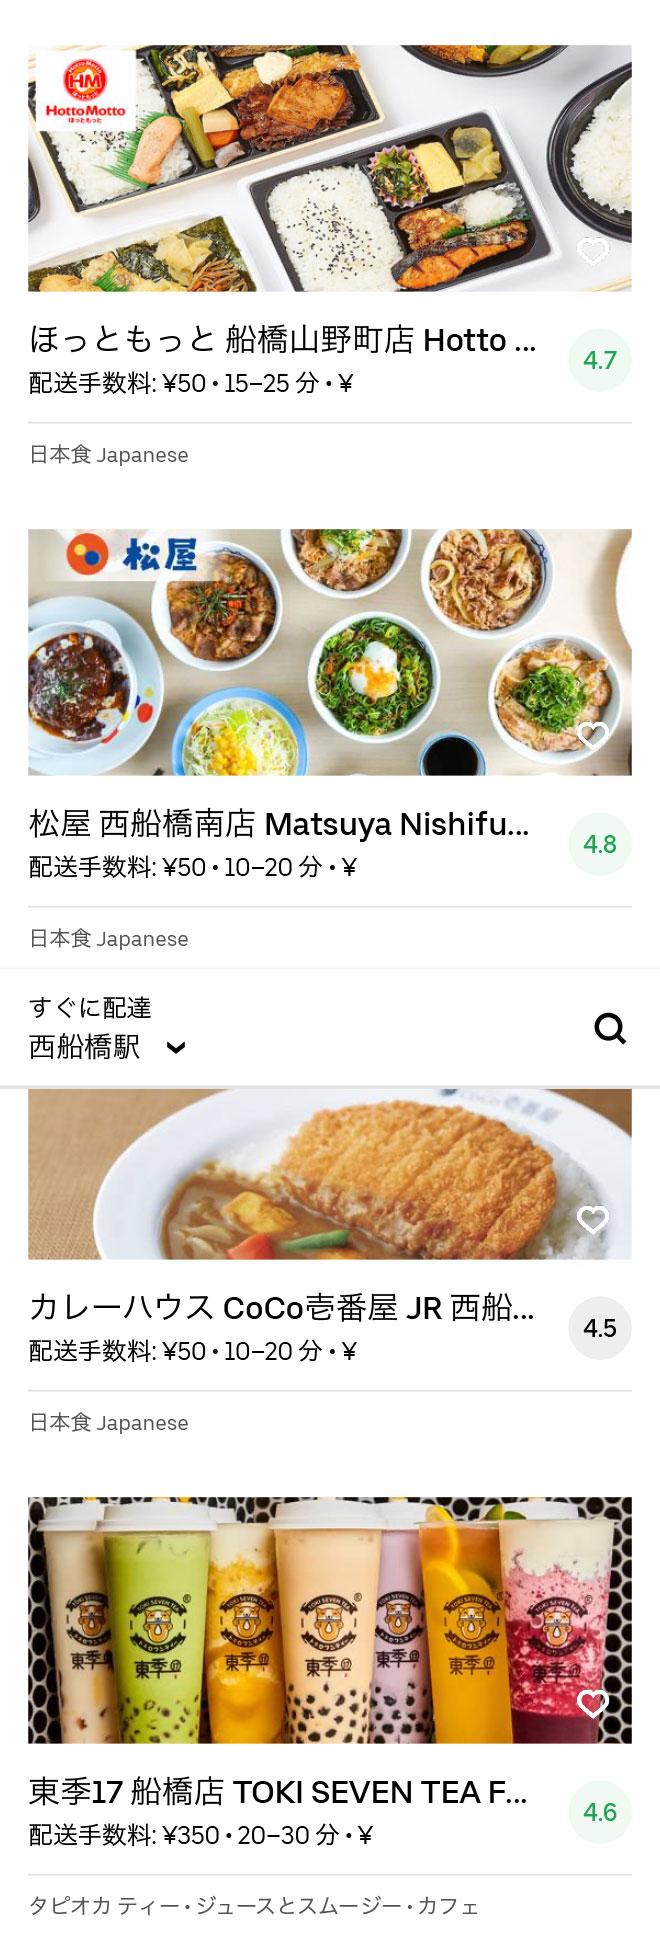 Funabashi nishi menu 2004 02